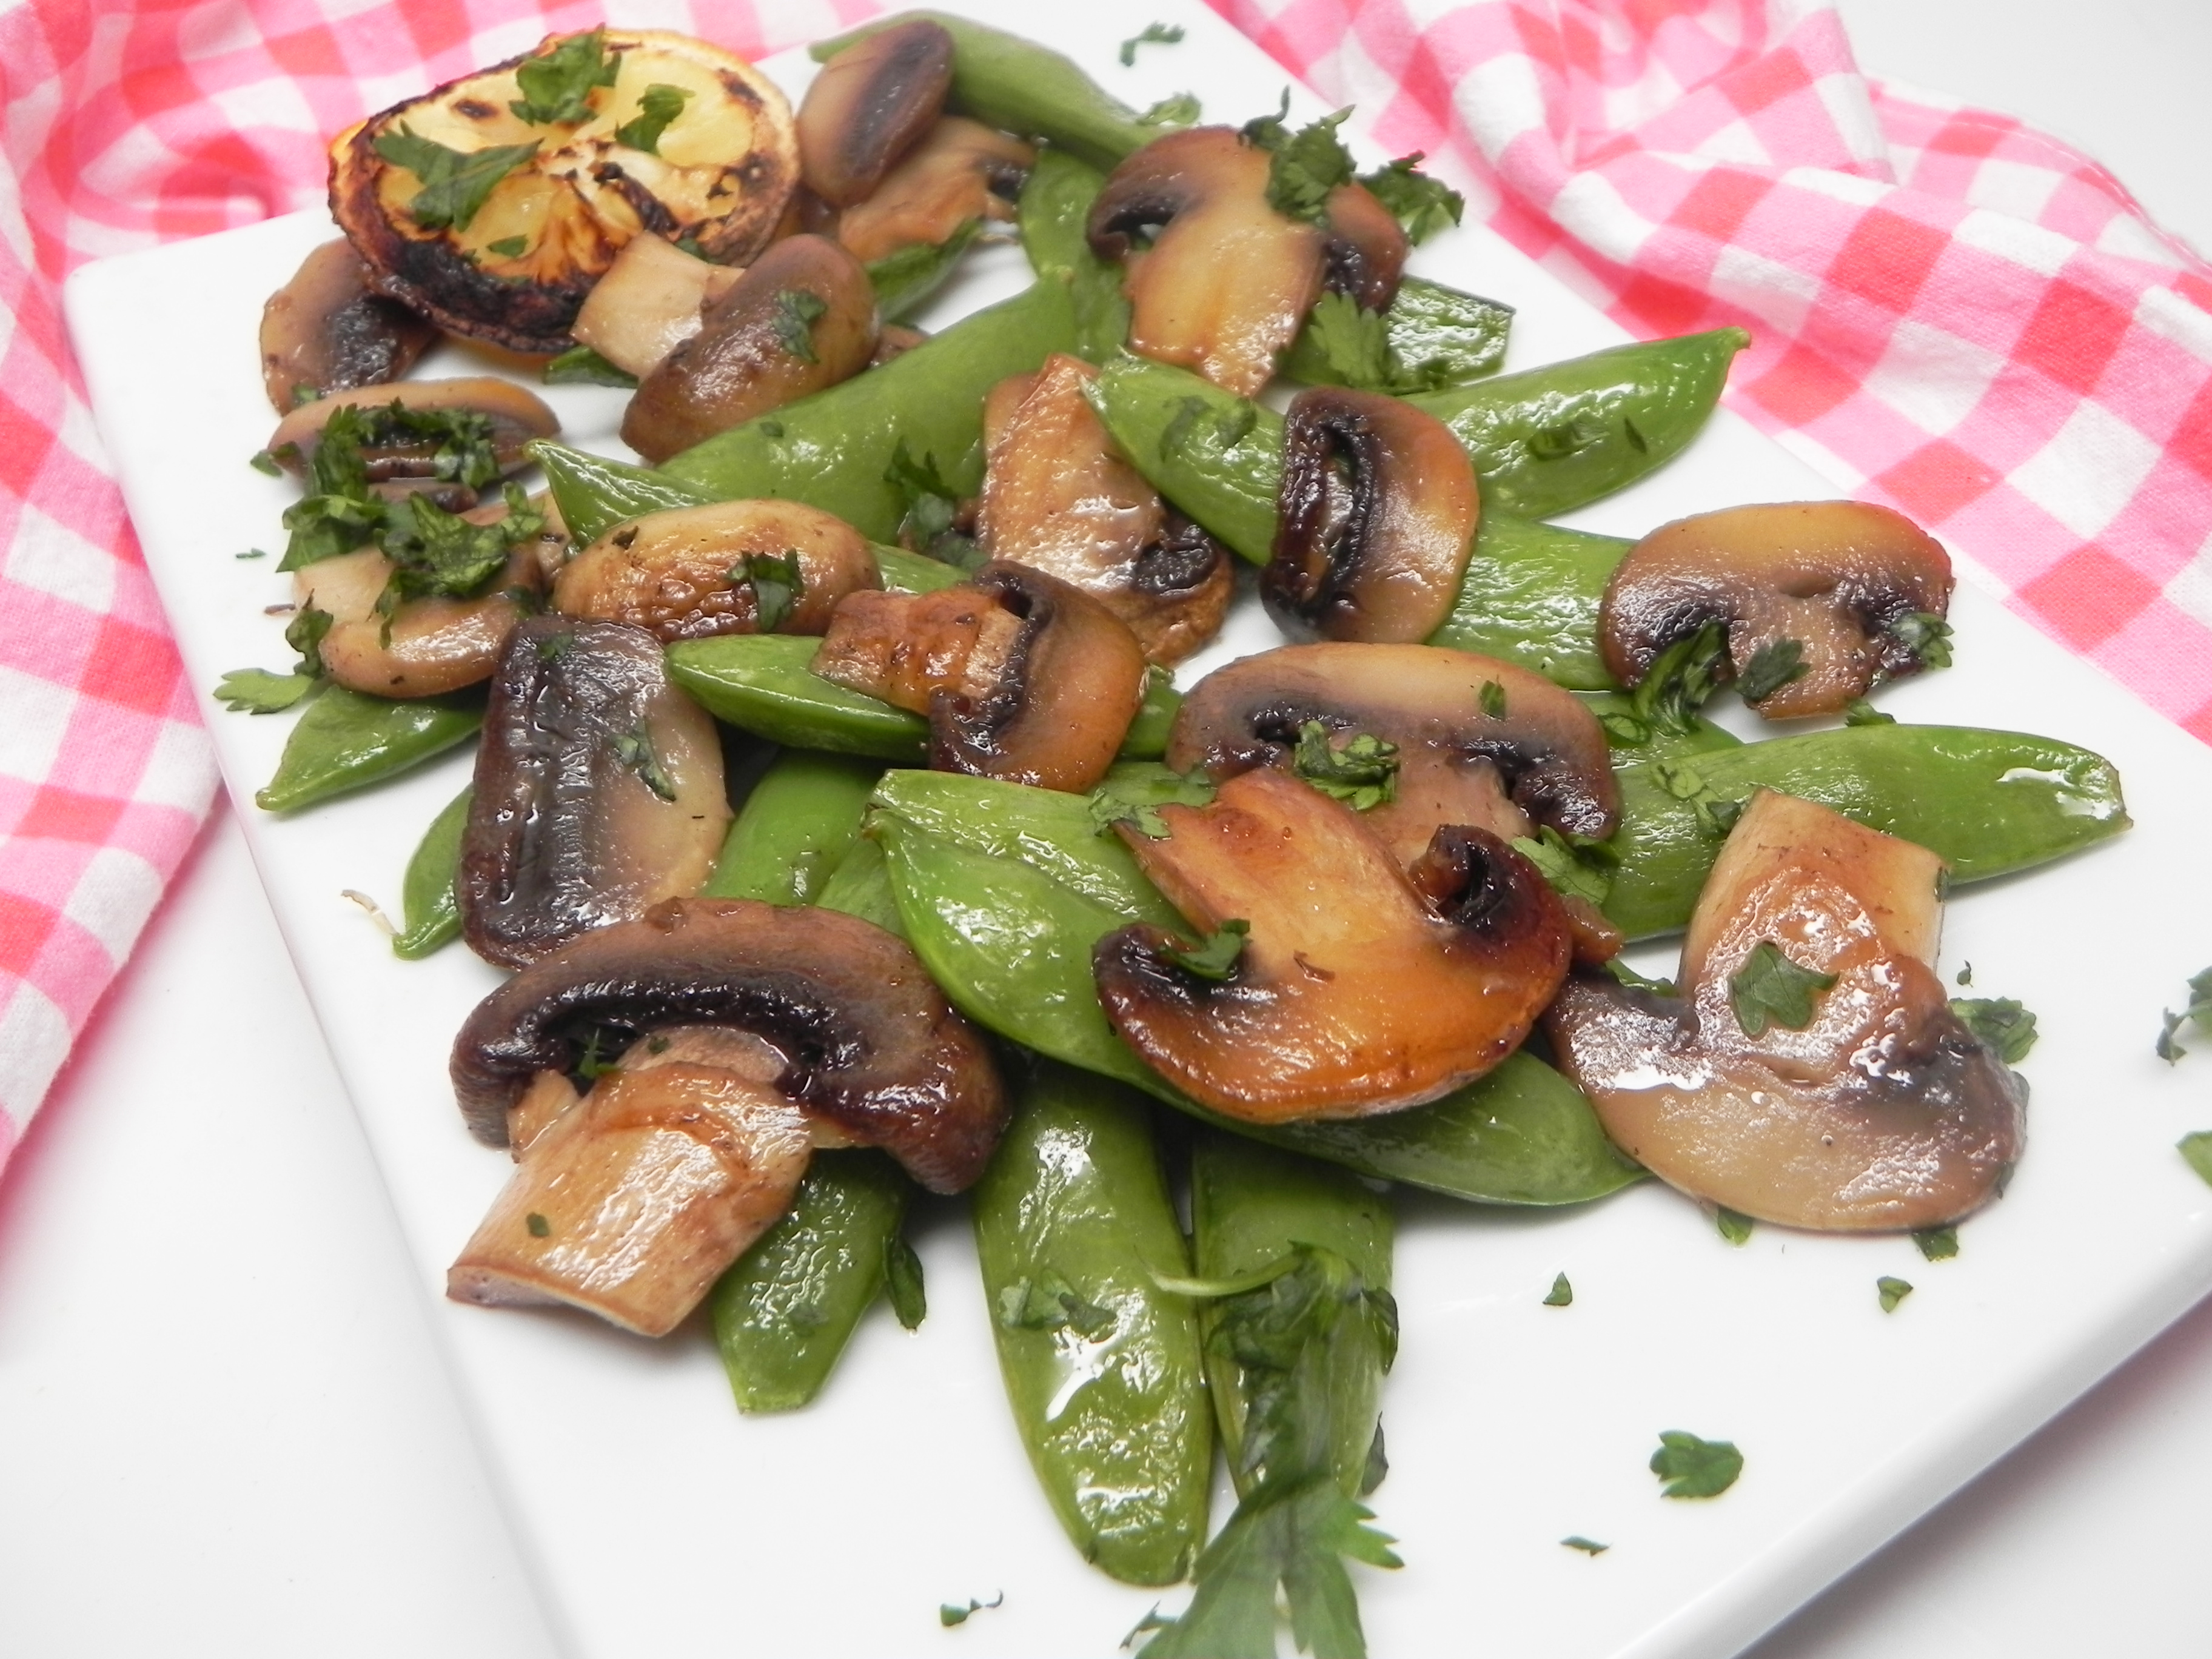 Sauteed Sugar Snap Peas with Mushrooms